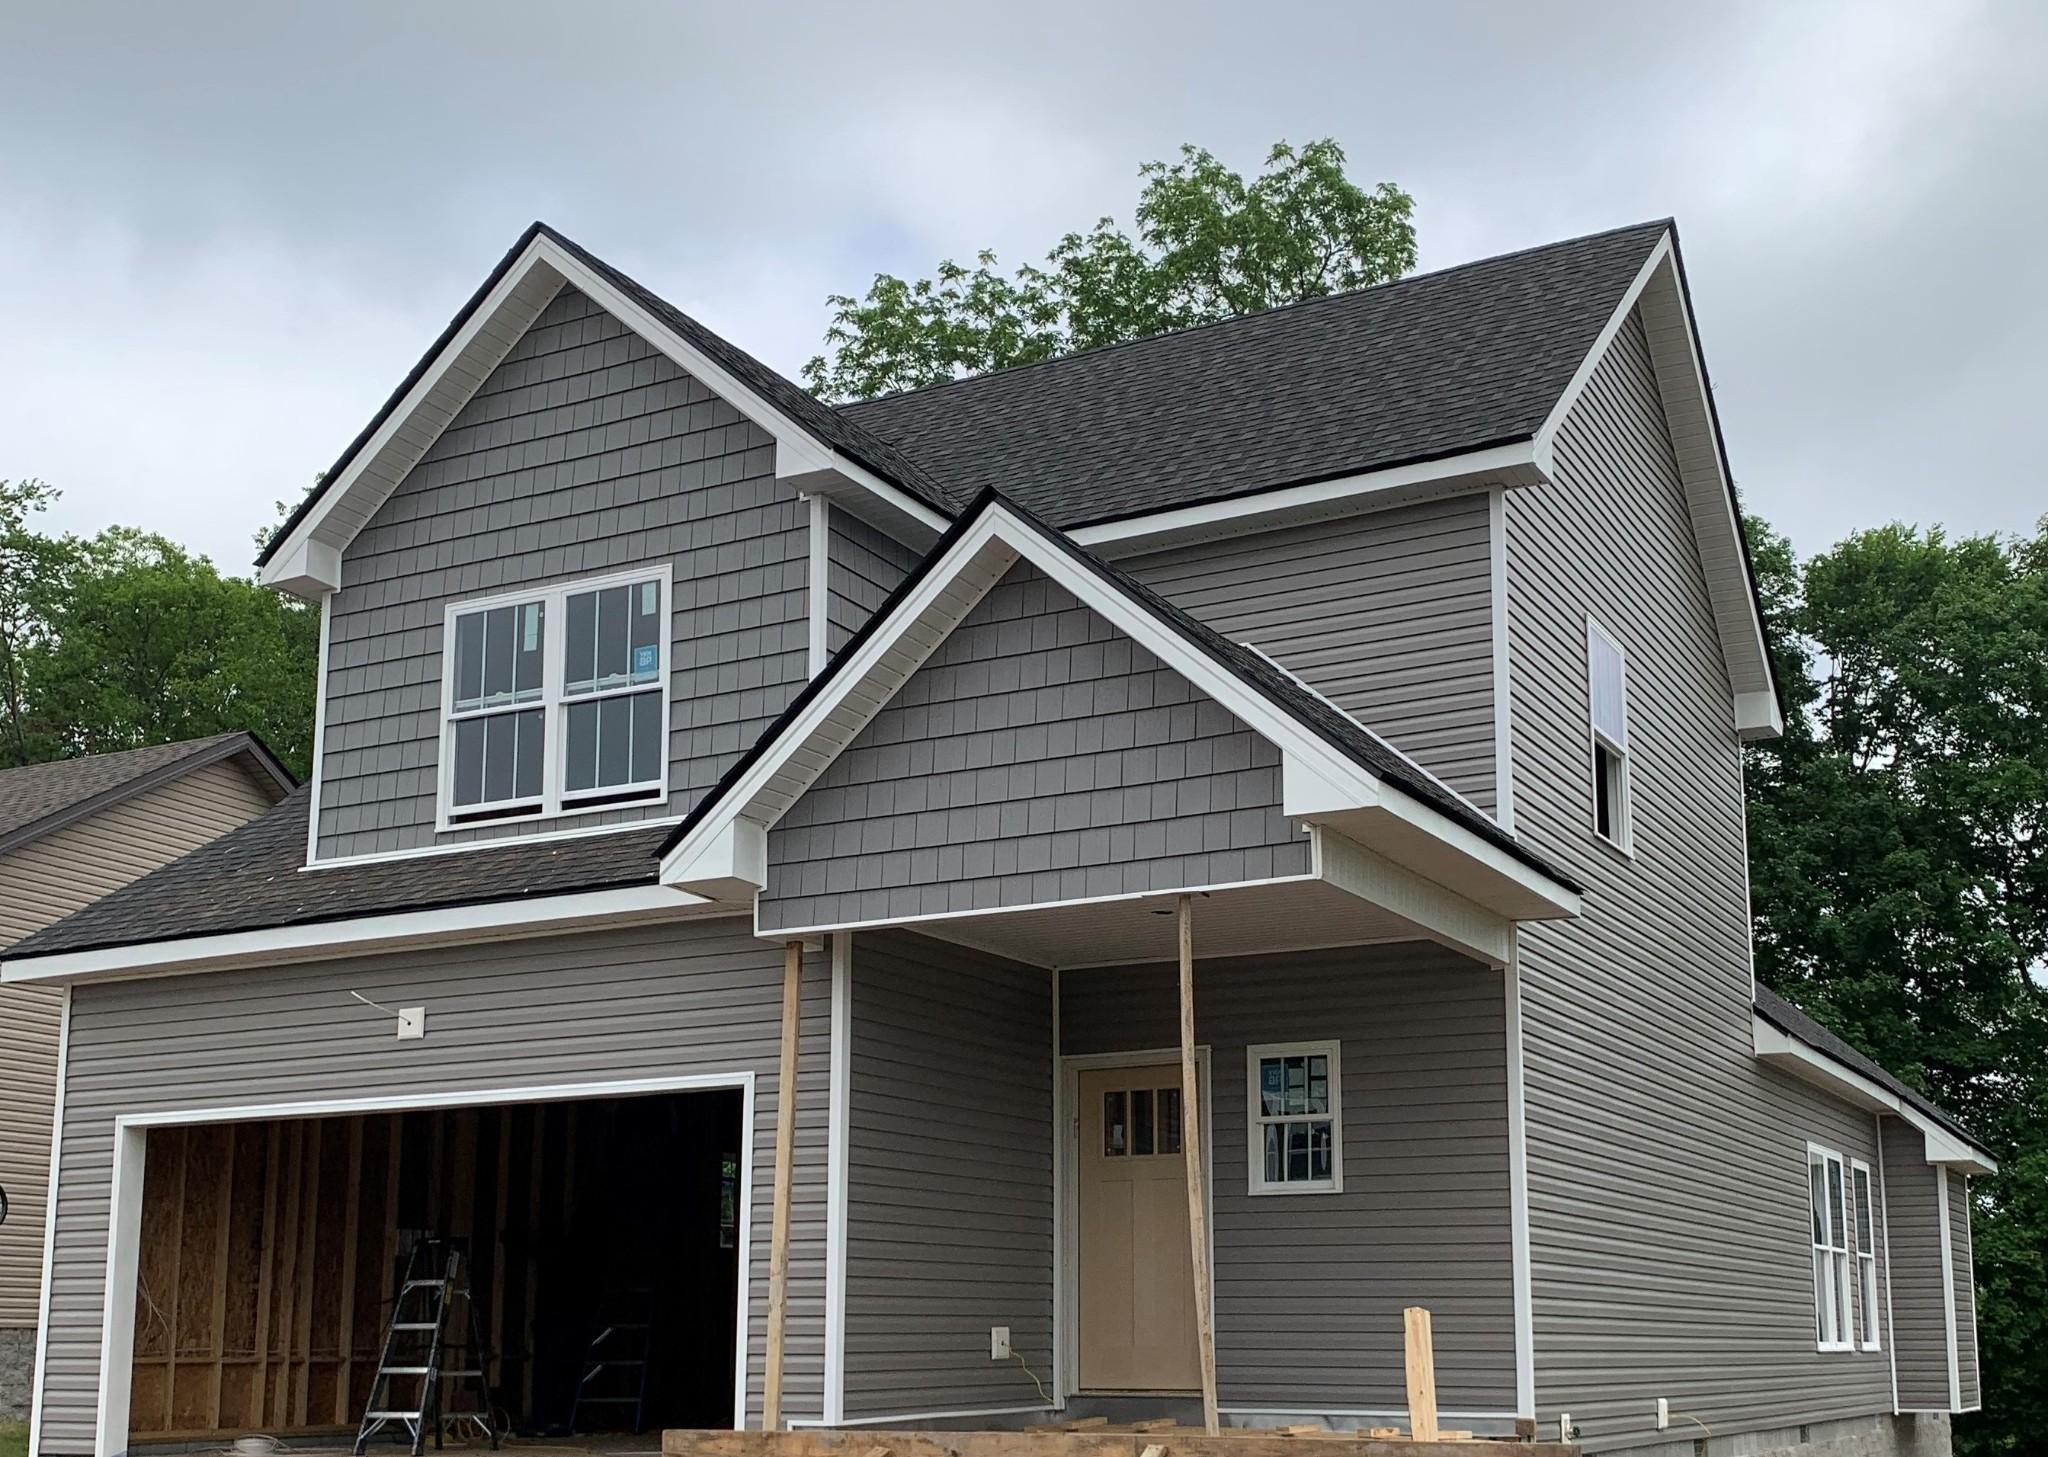 1892 Rains Rd, Clarksville, TN 37042 - Clarksville, TN real estate listing